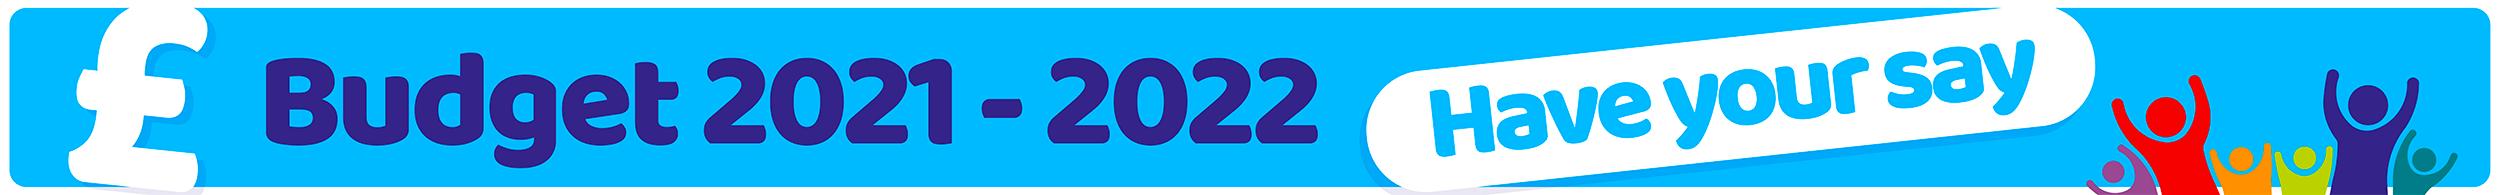 Budget 2021-22 header 2